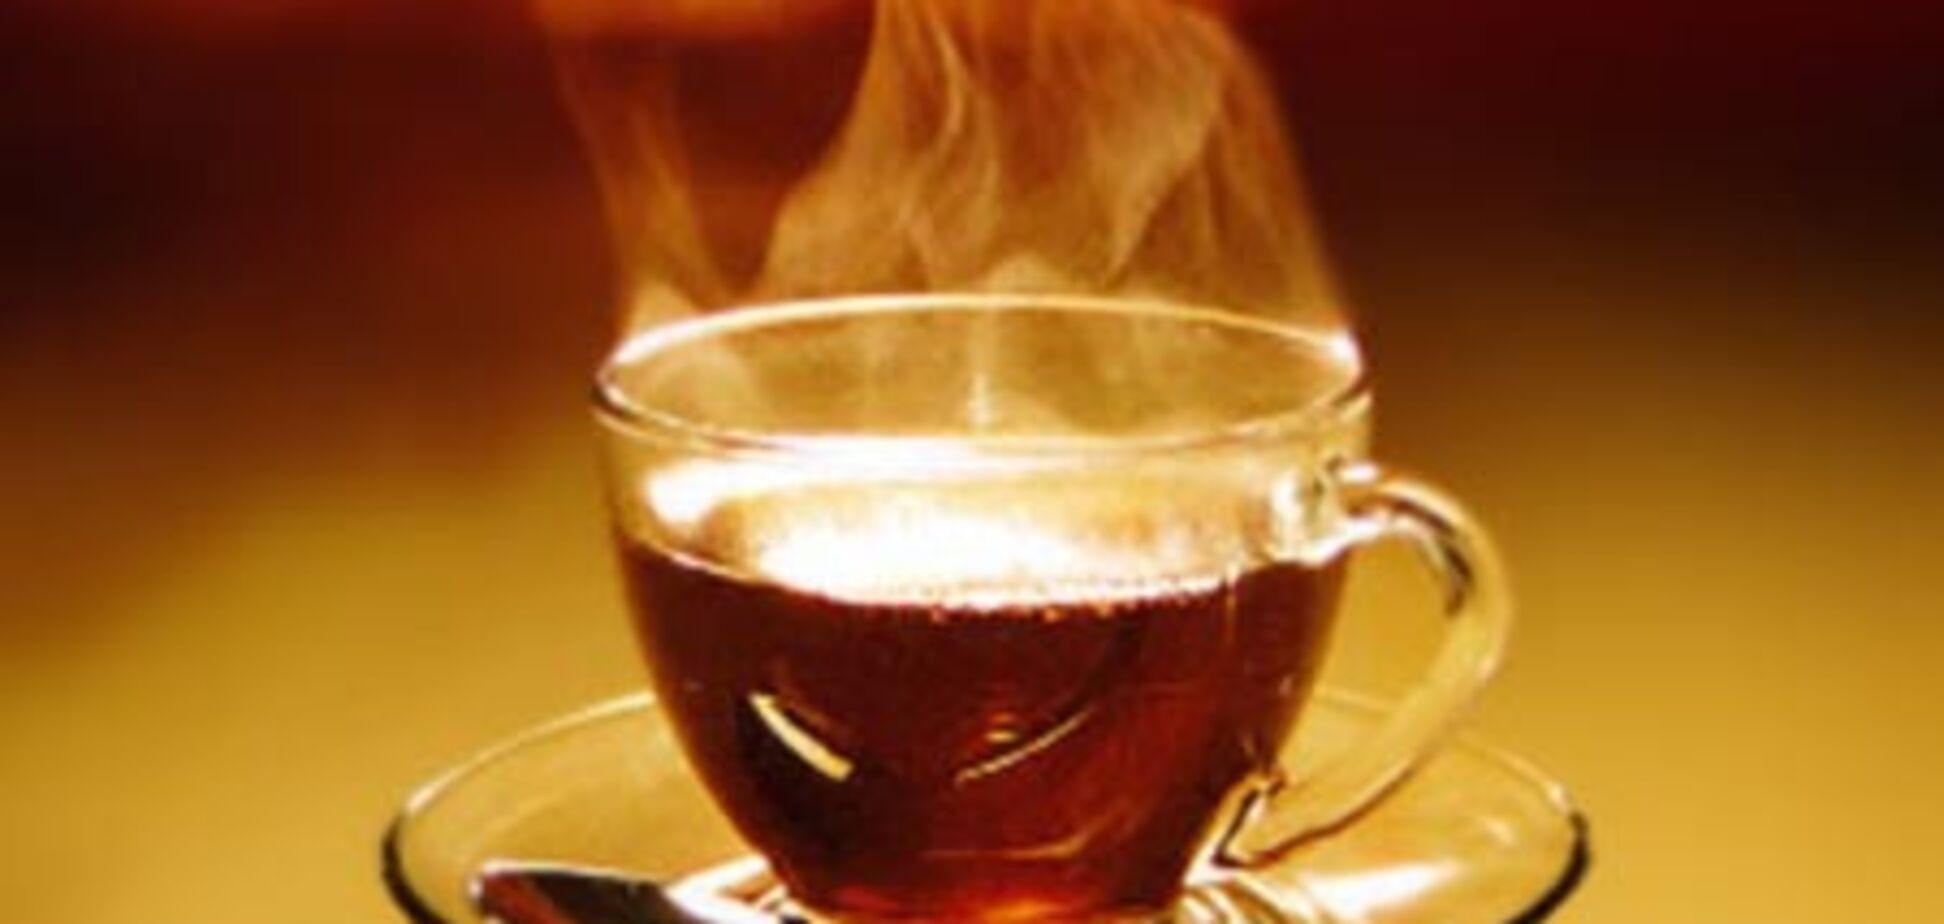 Чай избавит от стресса